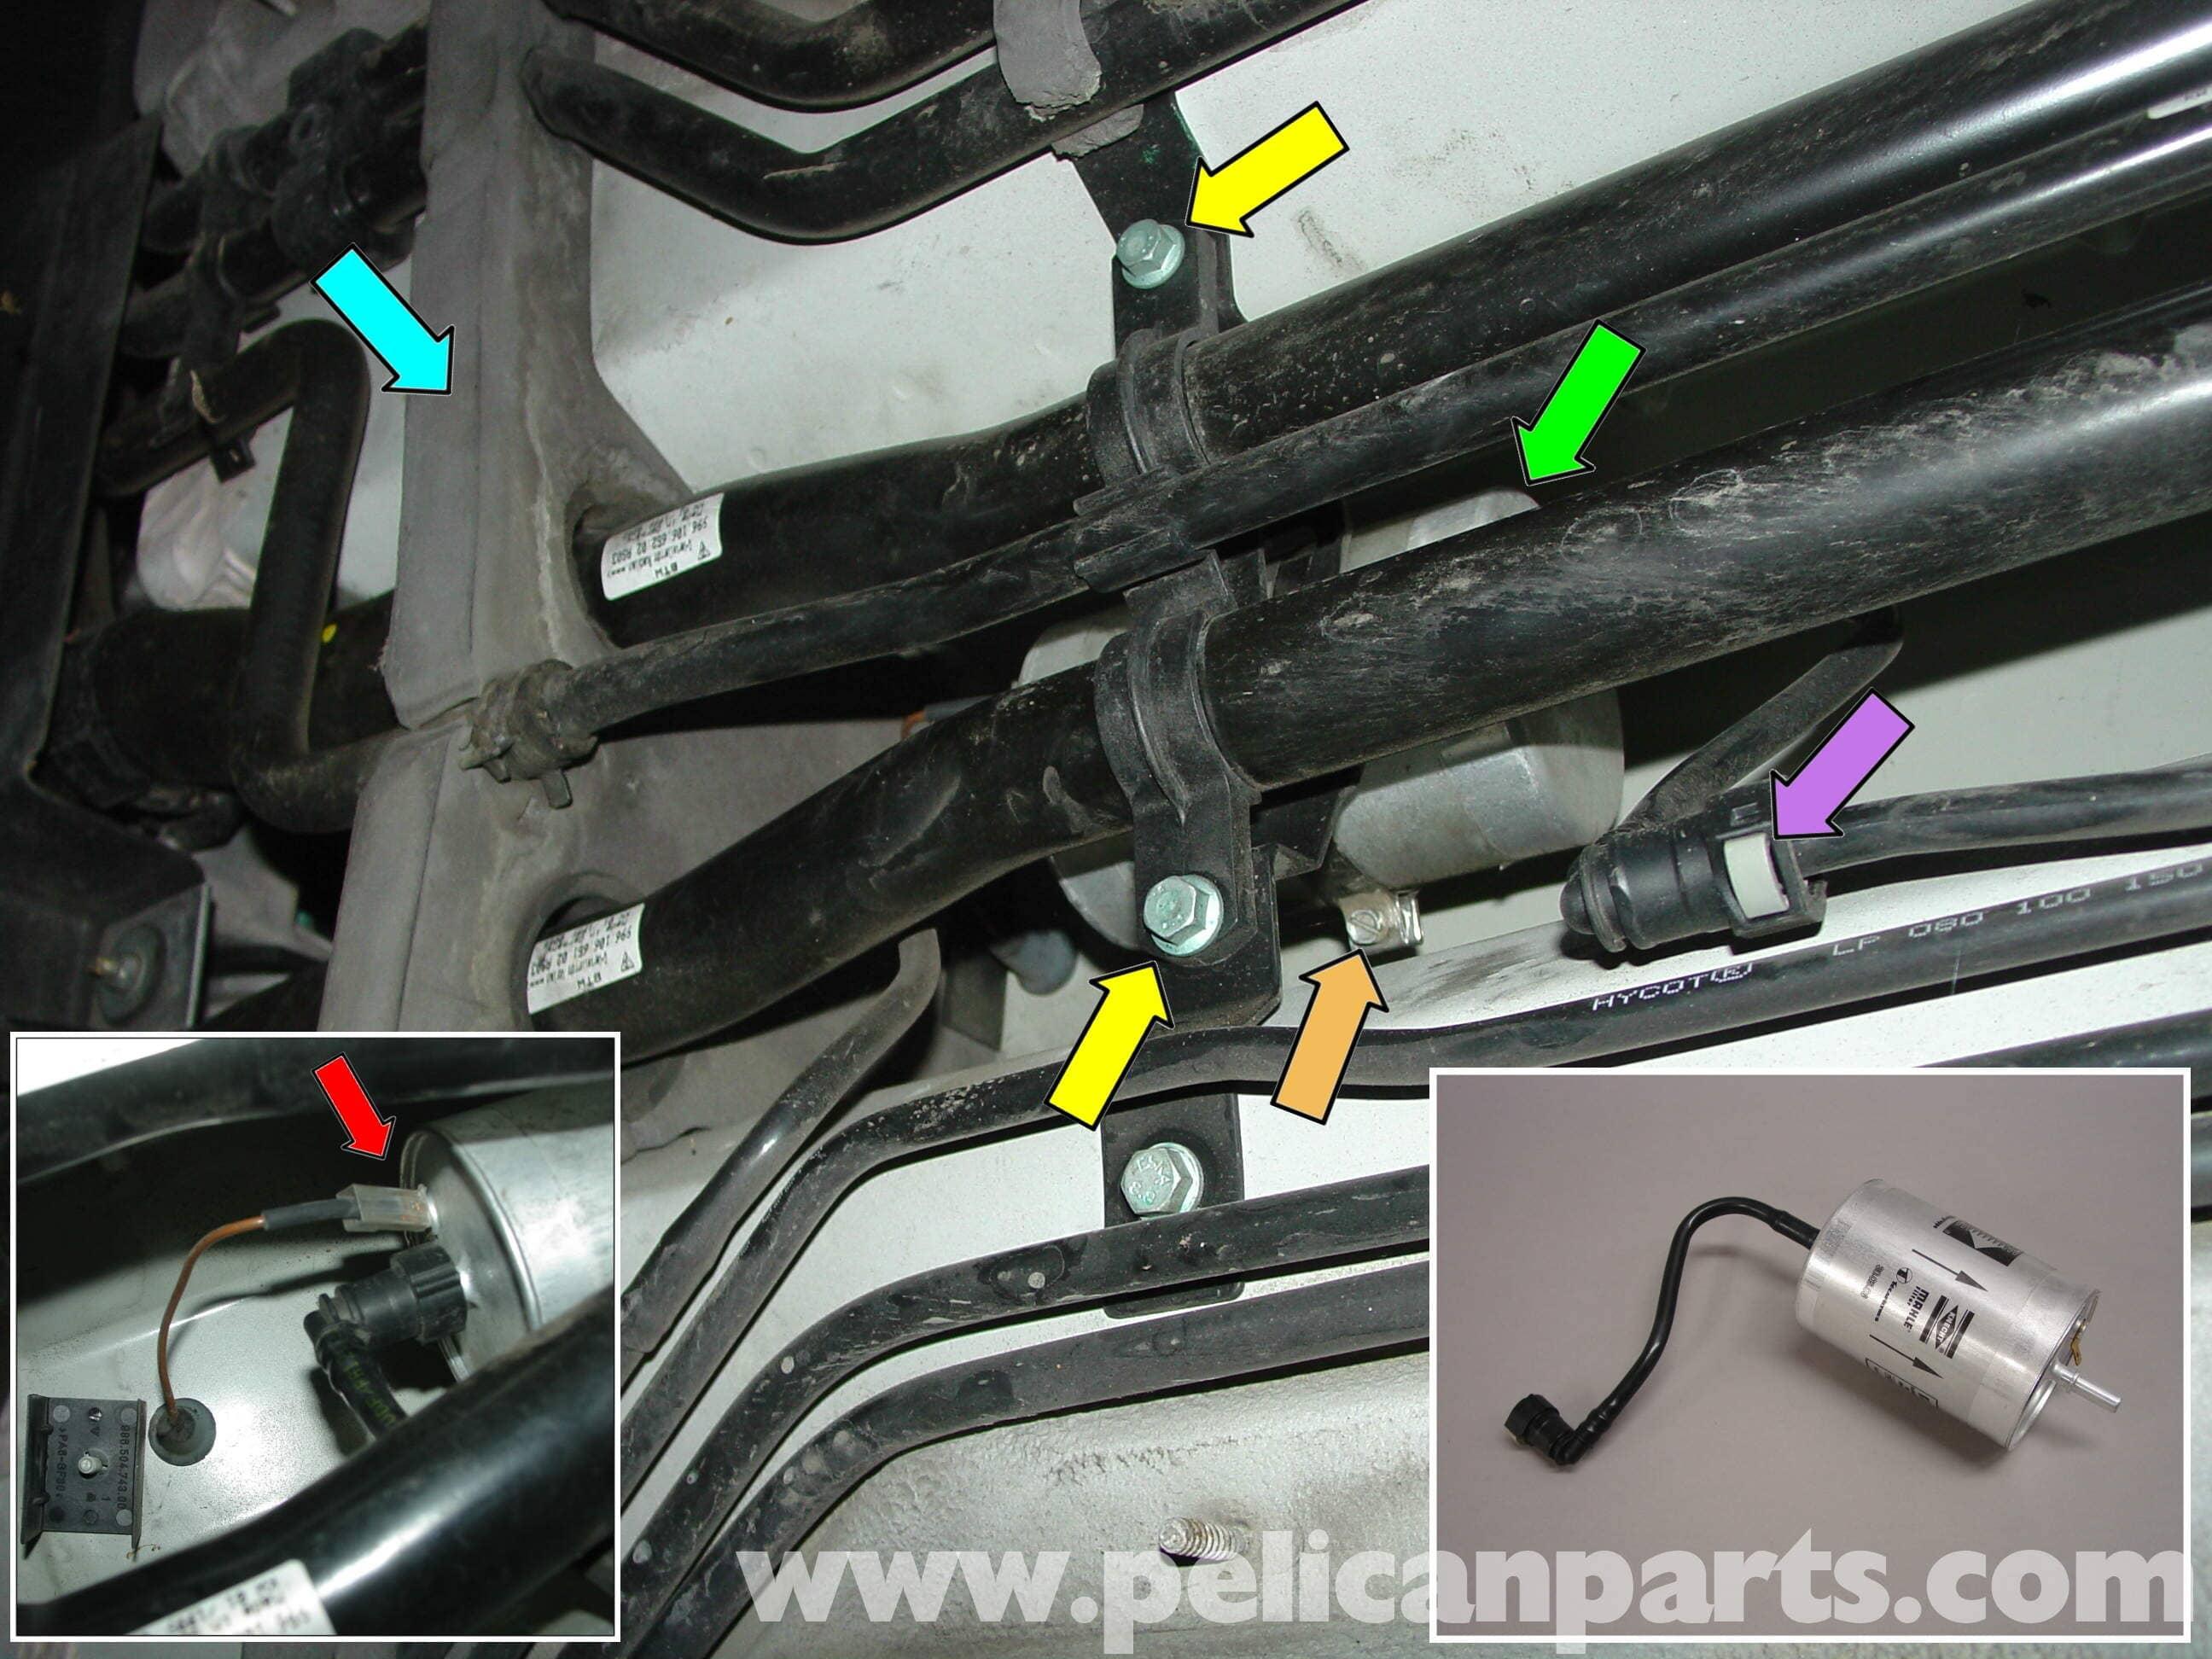 Porsche Boxster Fuel Filter Replacement 986 987 1997